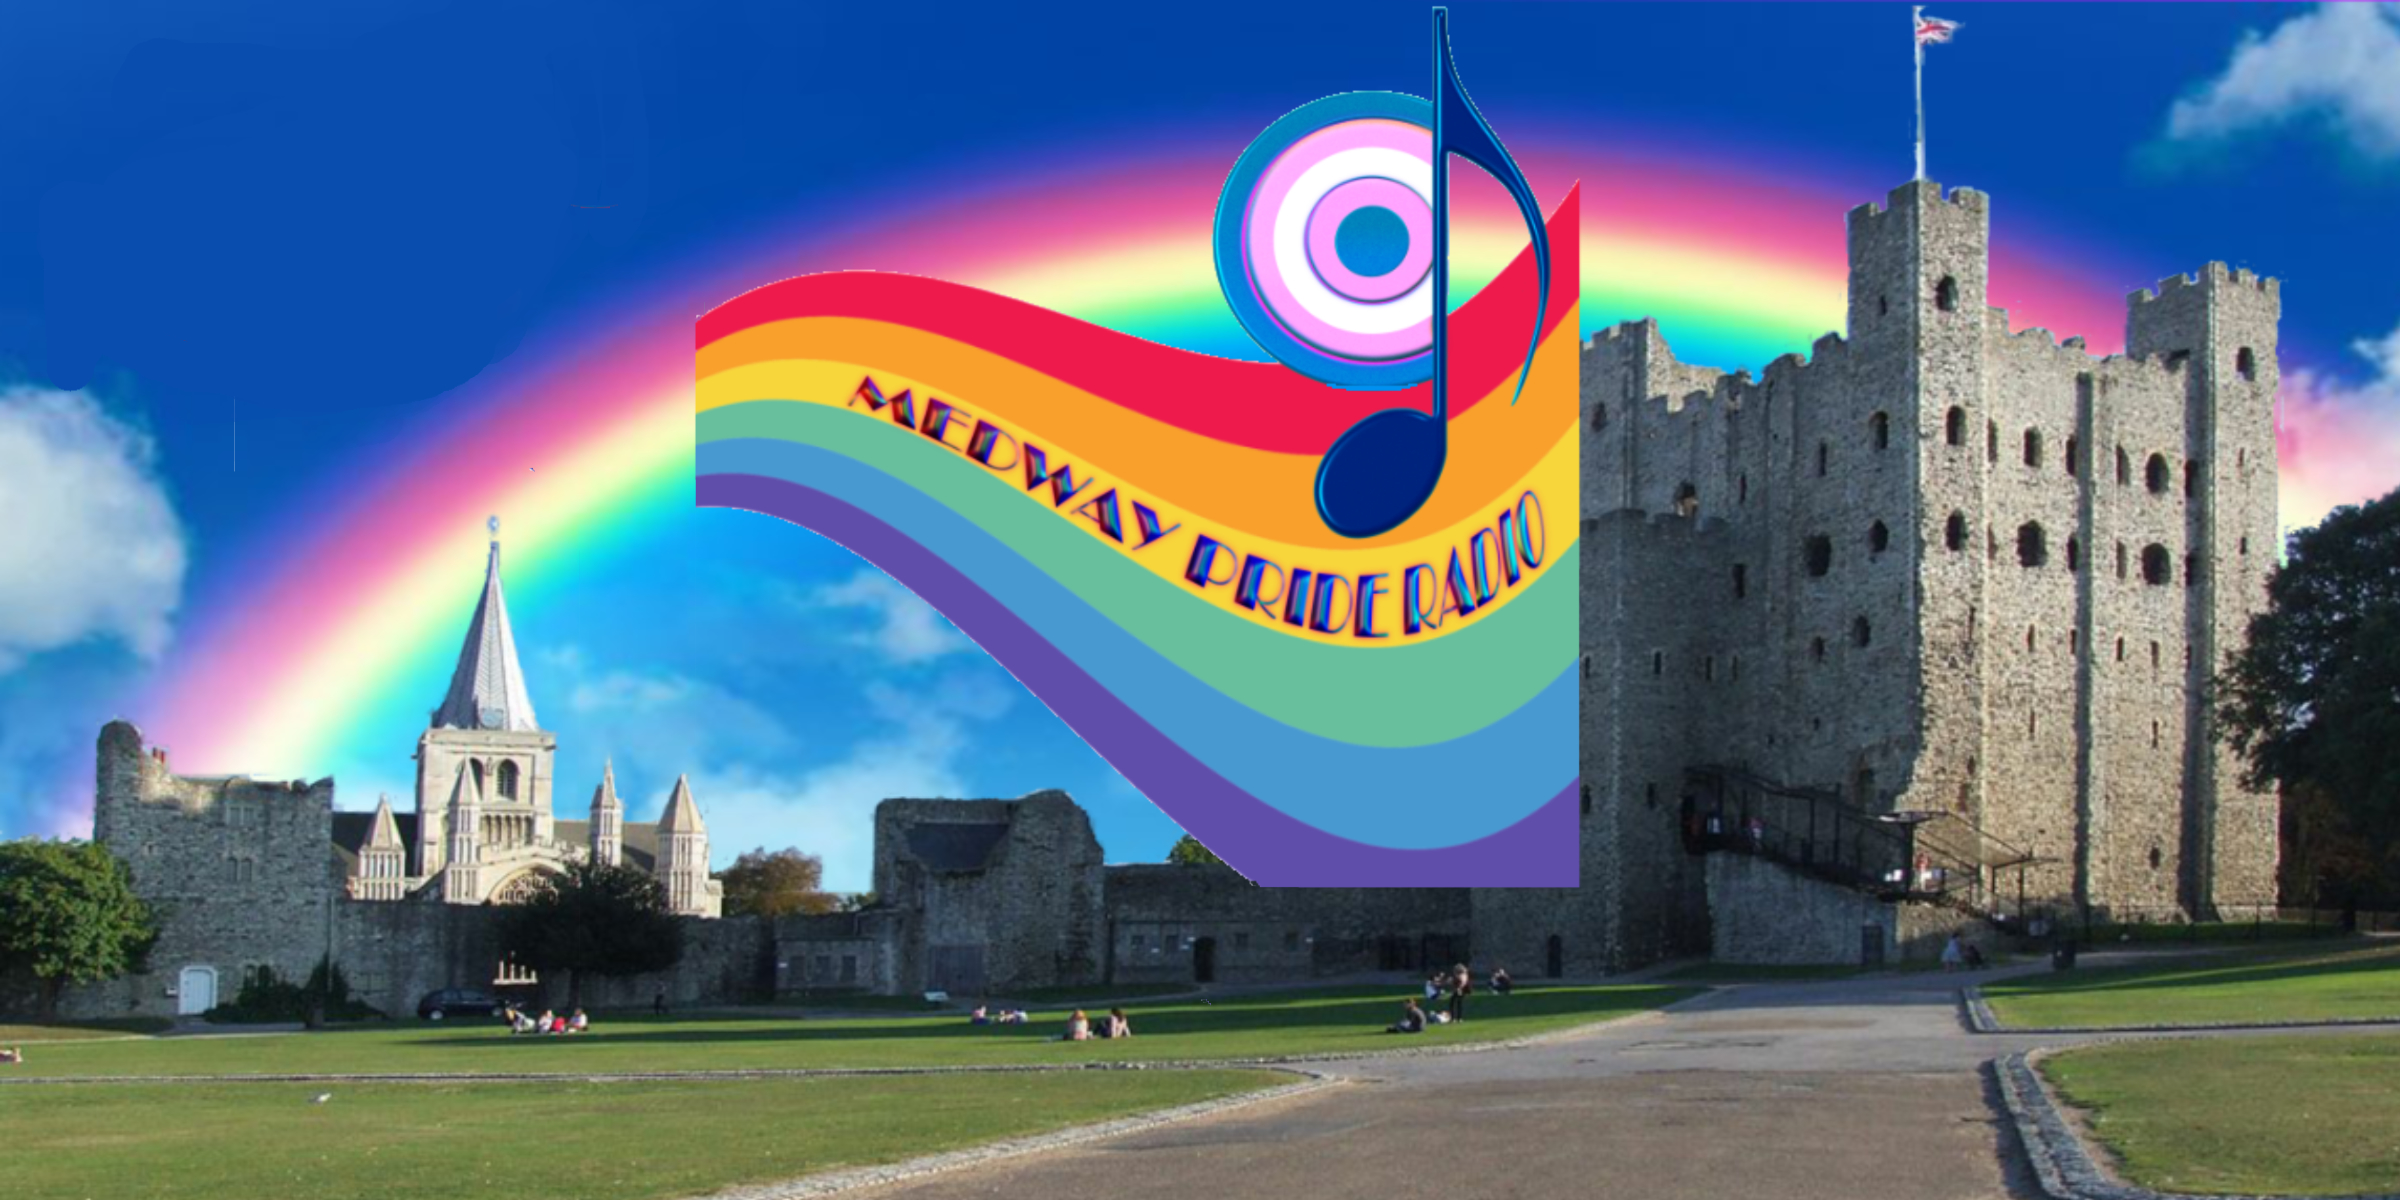 Medway Pride Radio